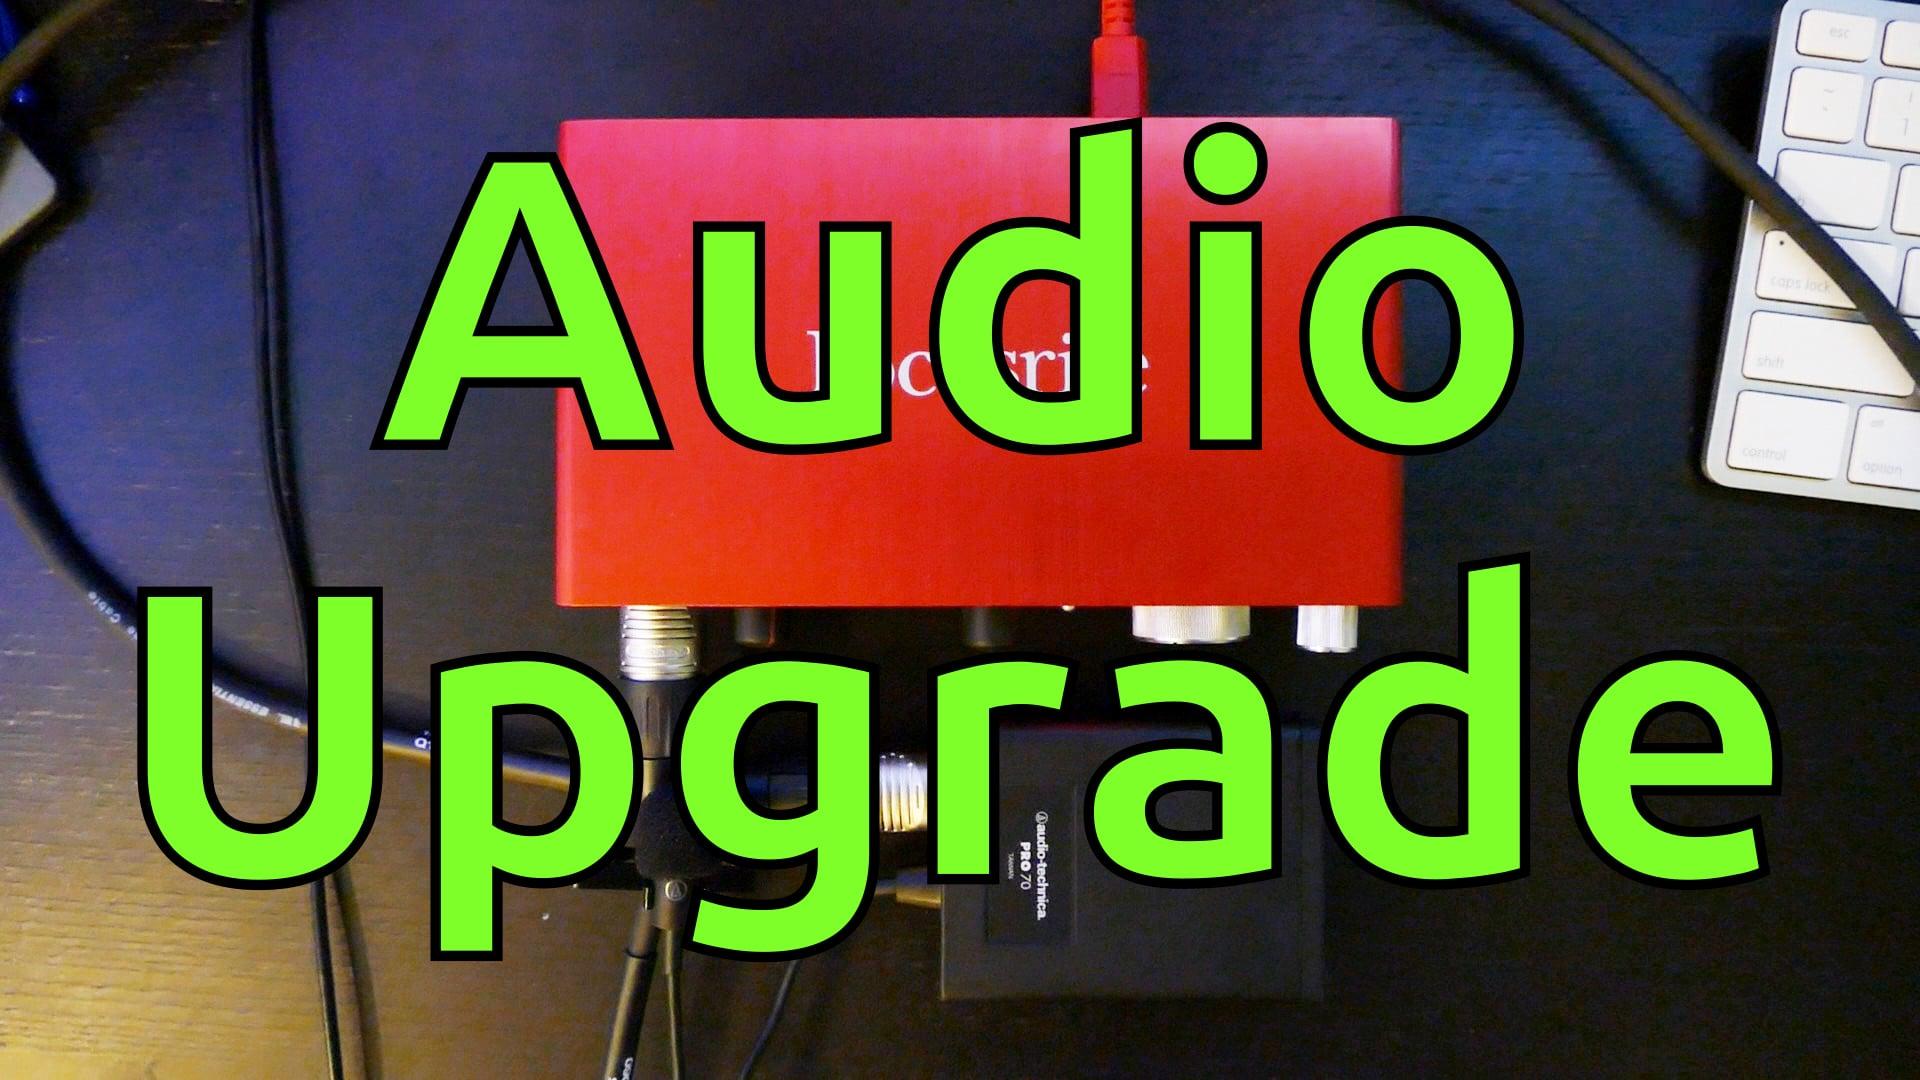 Audio-Technica Pro 70 & Focusrite Scarlett 2i2 Unboxing